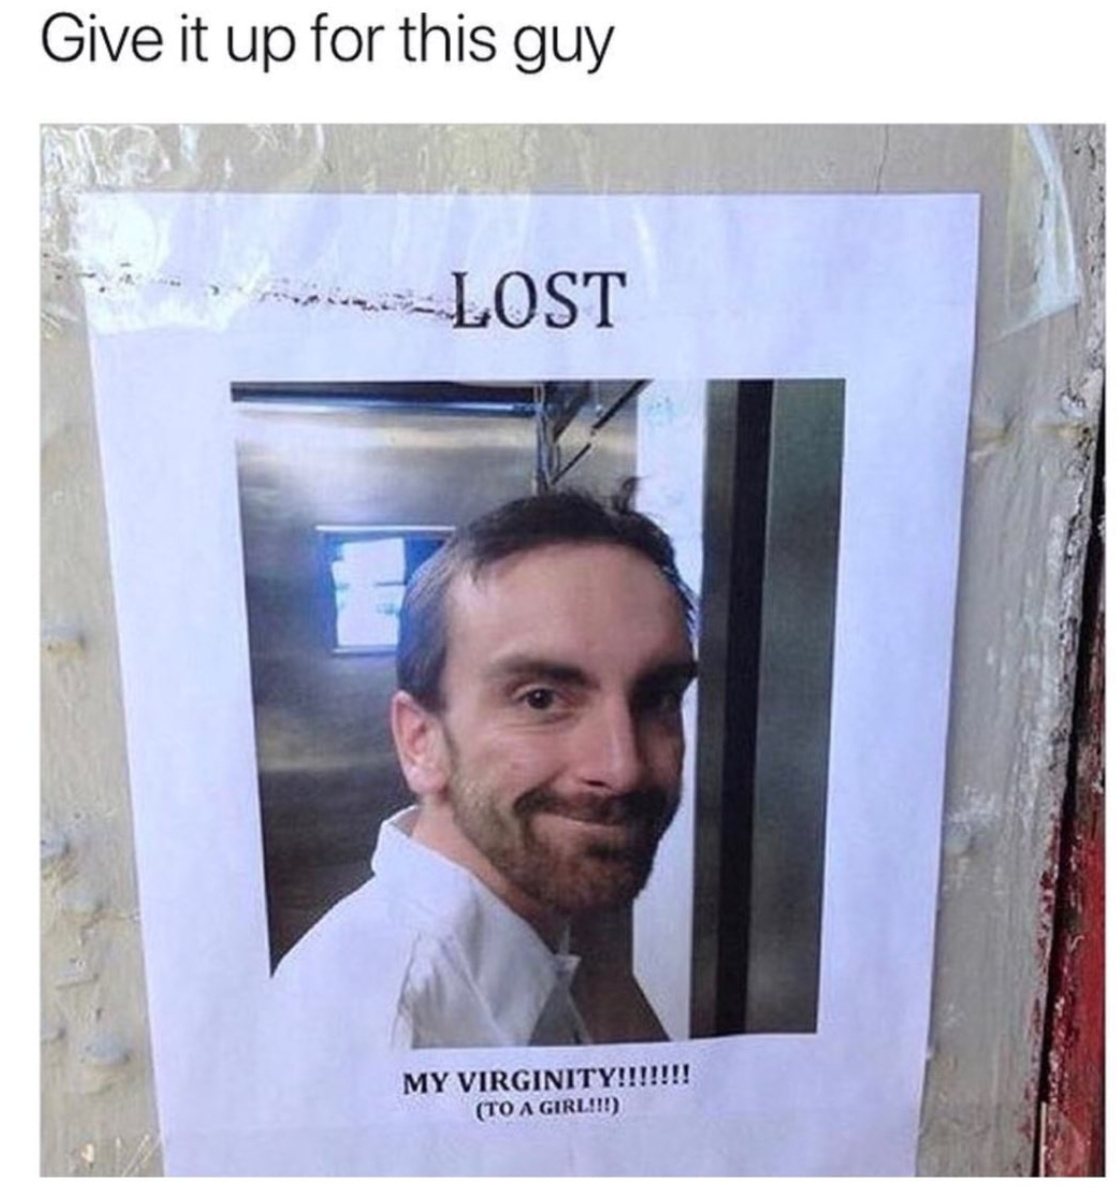 Yay Good Job Meme Subido Por Gamerplayer Memedroid So here's a wholesome meme. memedroid